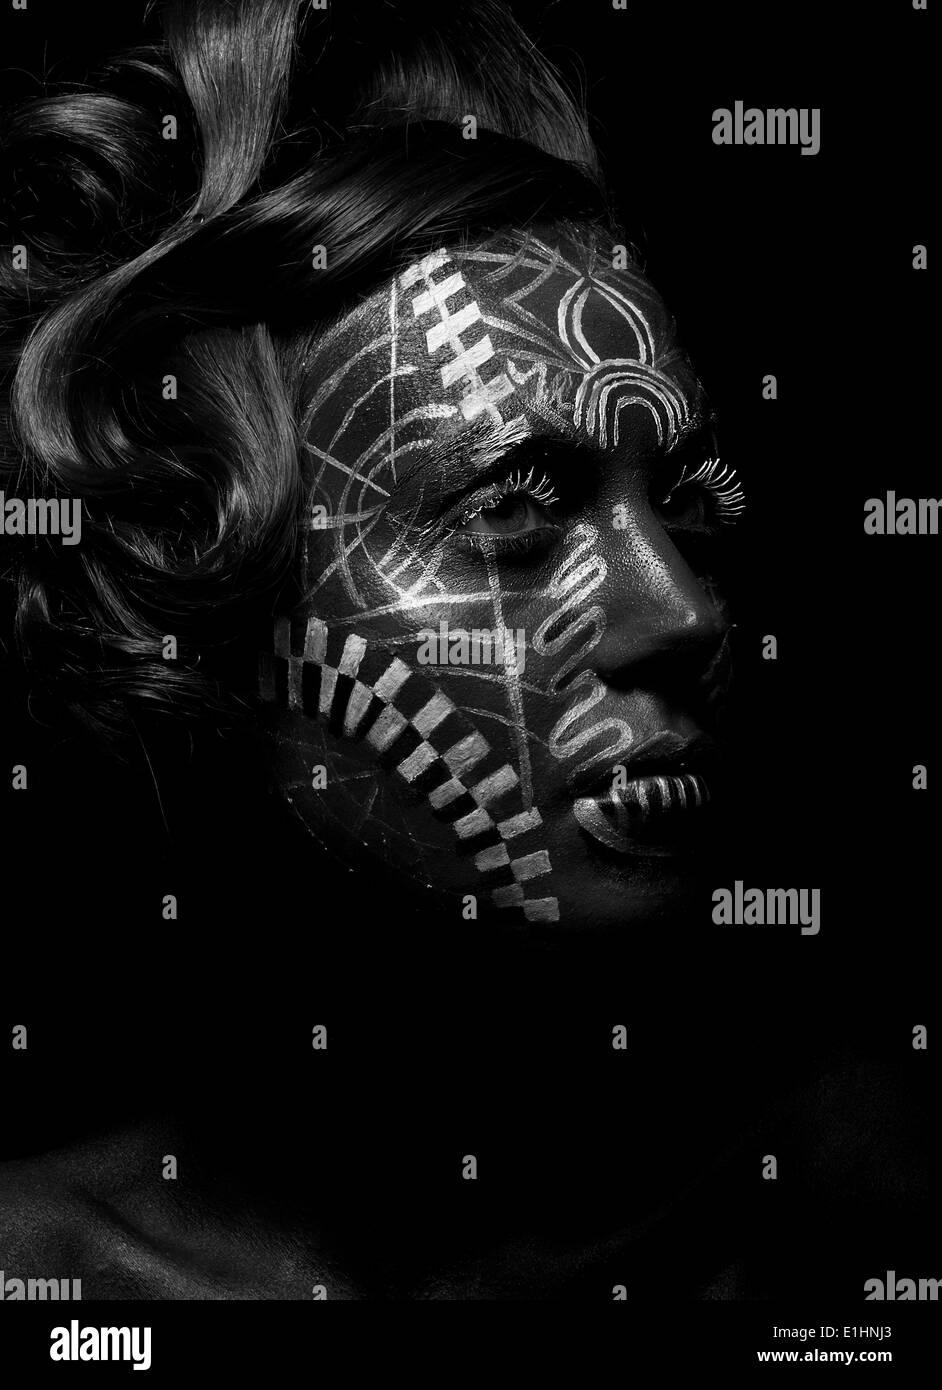 Savage mujer religiosa voodoo con tatuaje ornamental. Persona de la tribu. Cara pintada Imagen De Stock